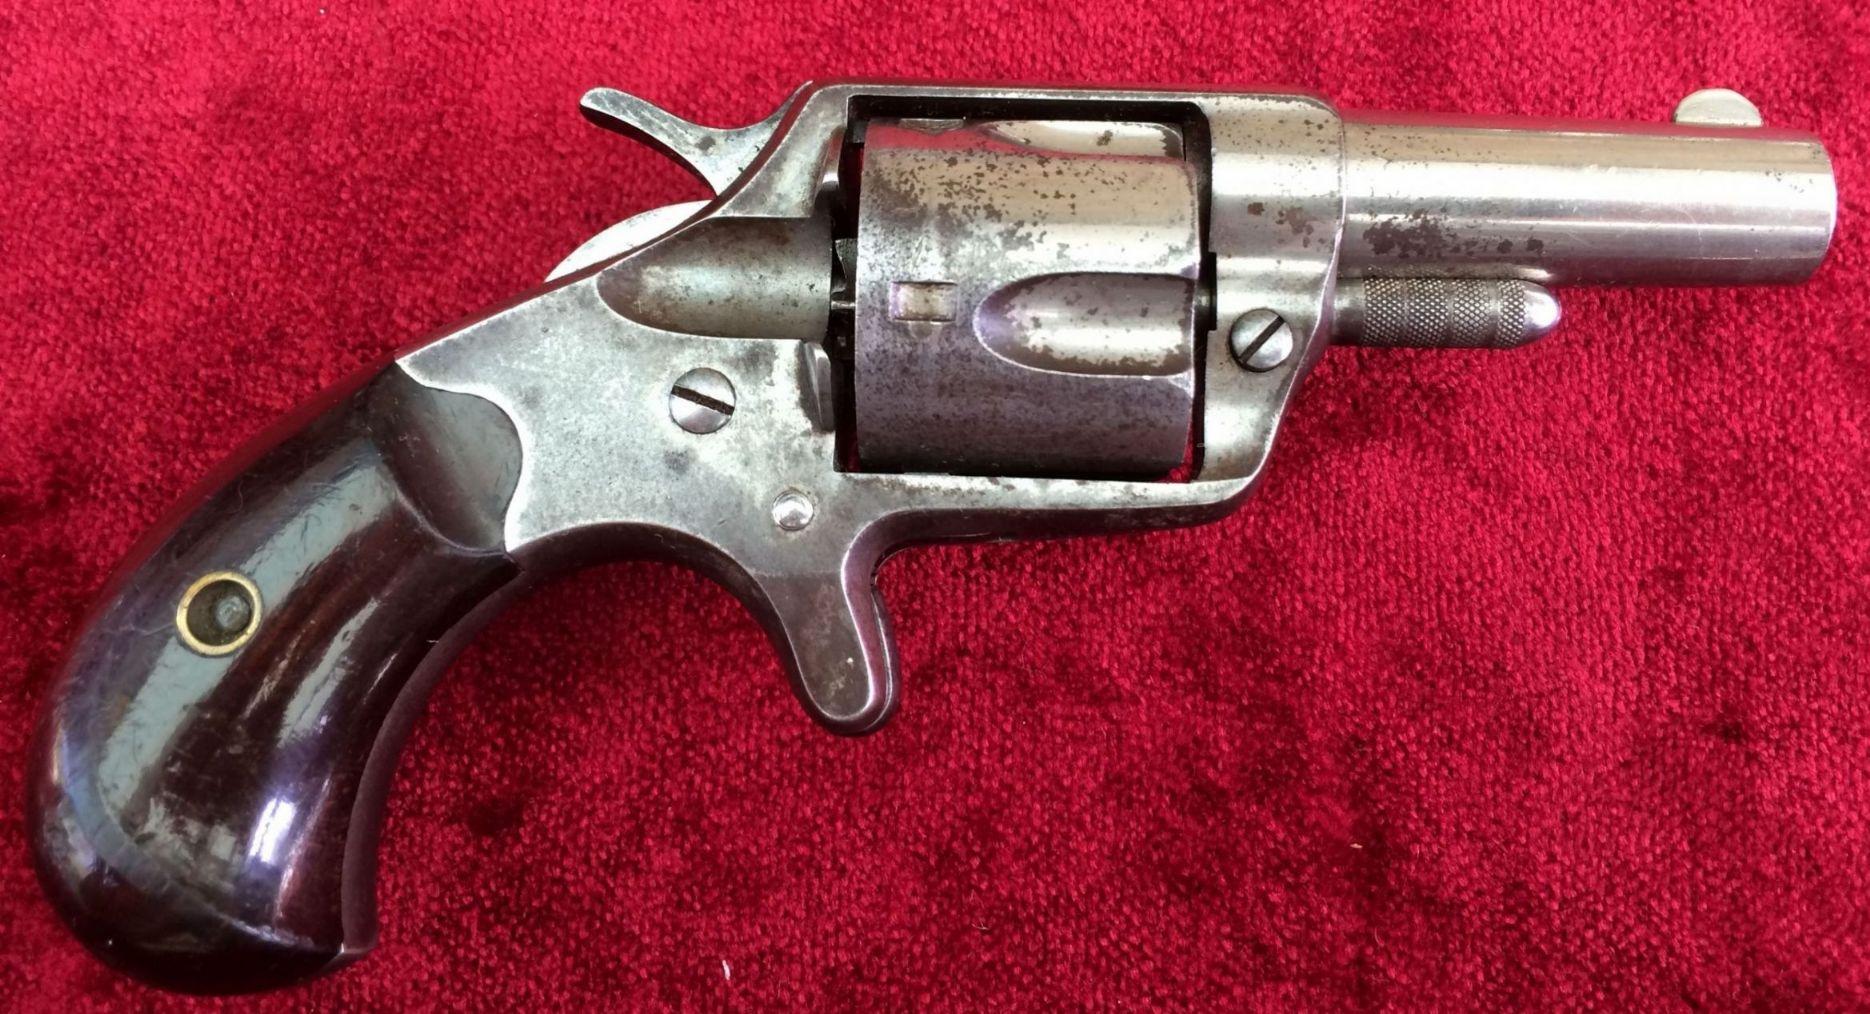 X X X SOLD X X X A scarce American Colt  41 cal Rimfire 5 shot